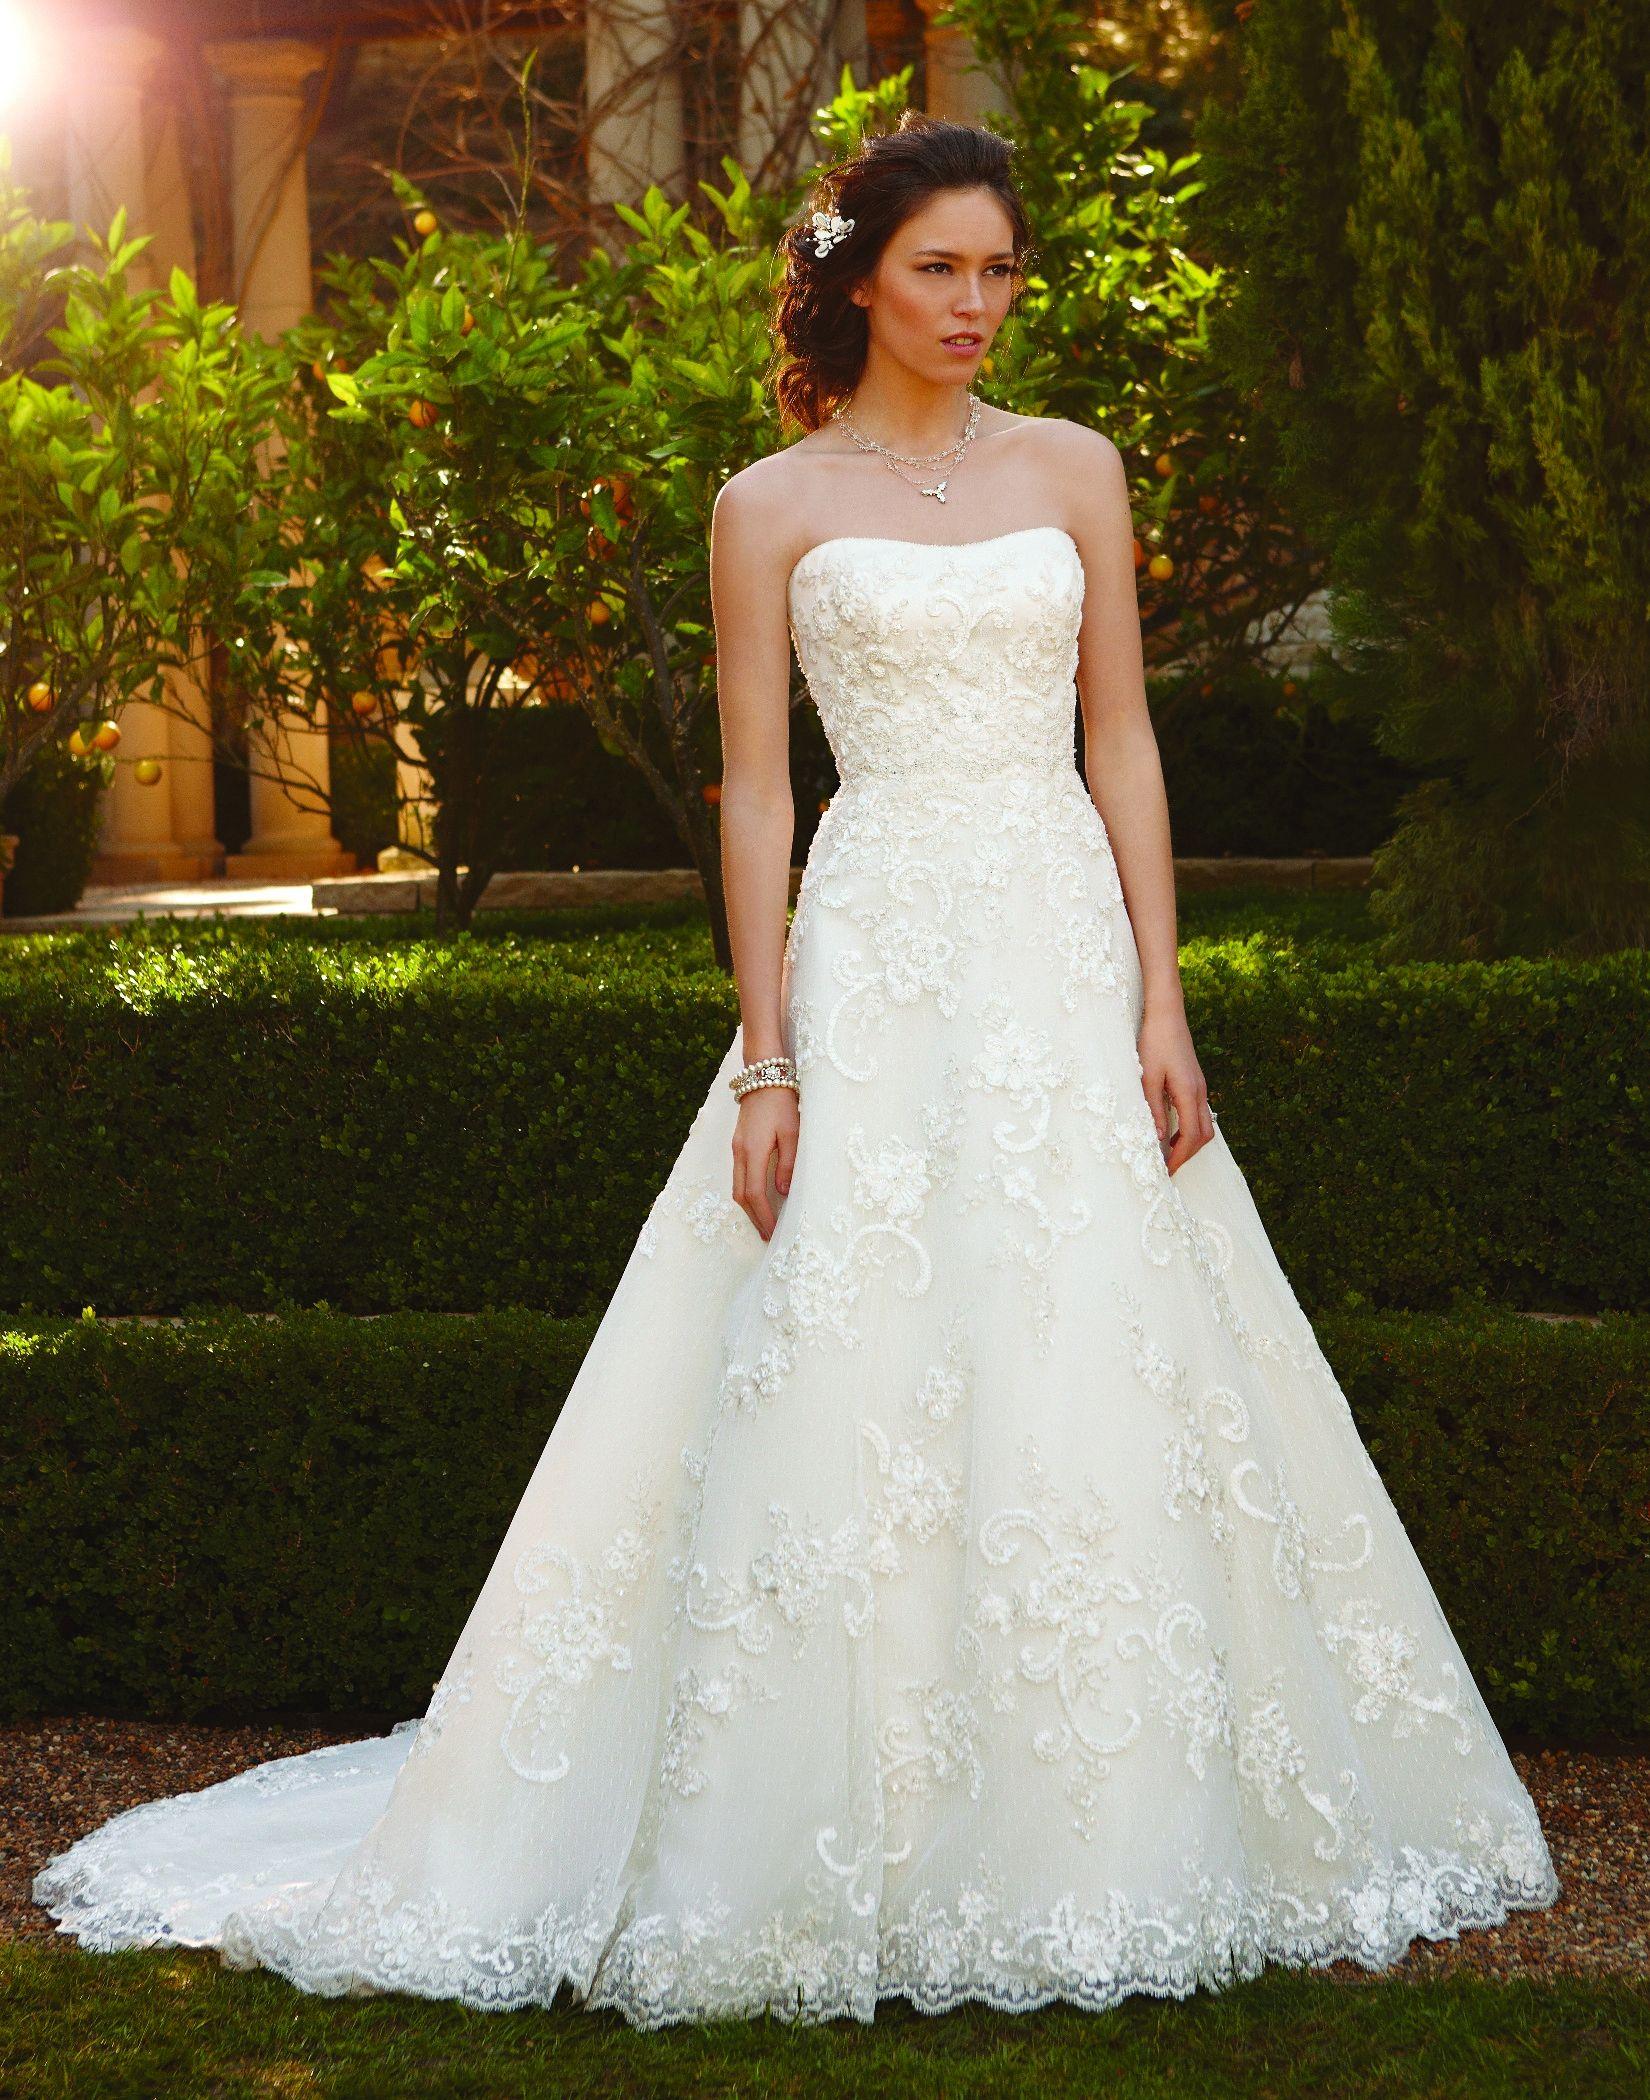 Casablanca bridal wedding dress style beaded lace sewn